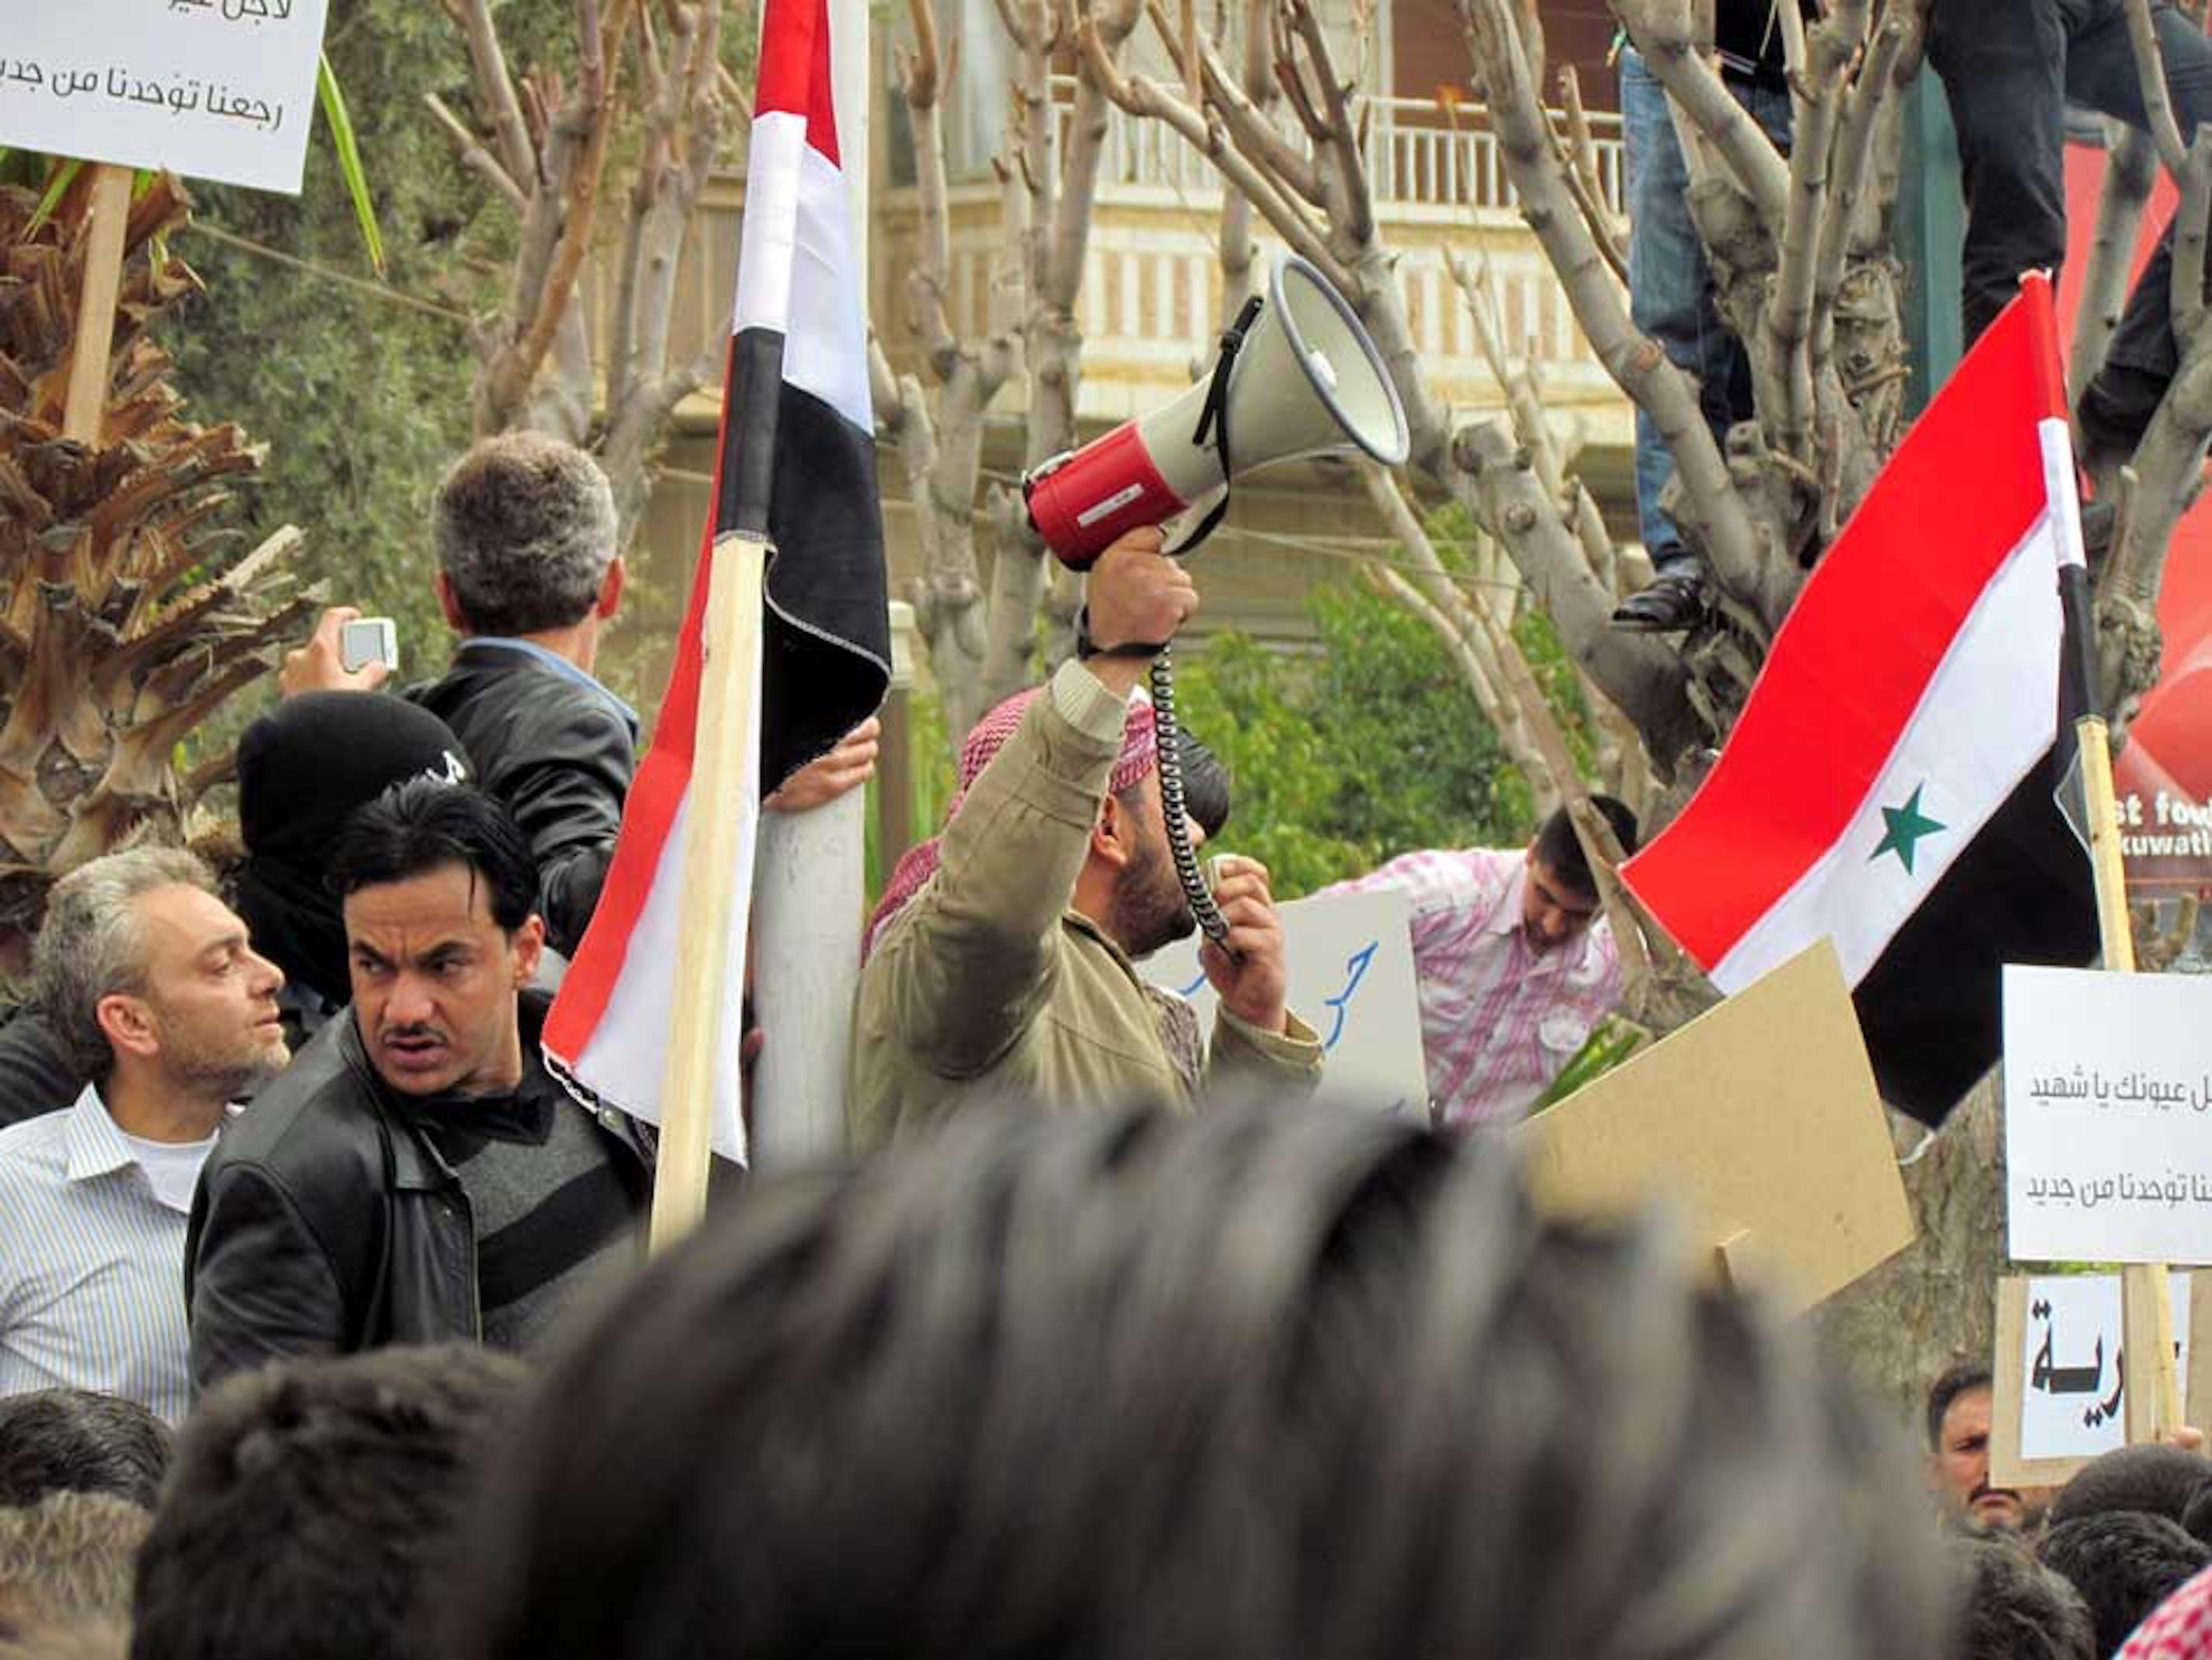 Manifestazioni anti-governative in Siria - ©UN News2011